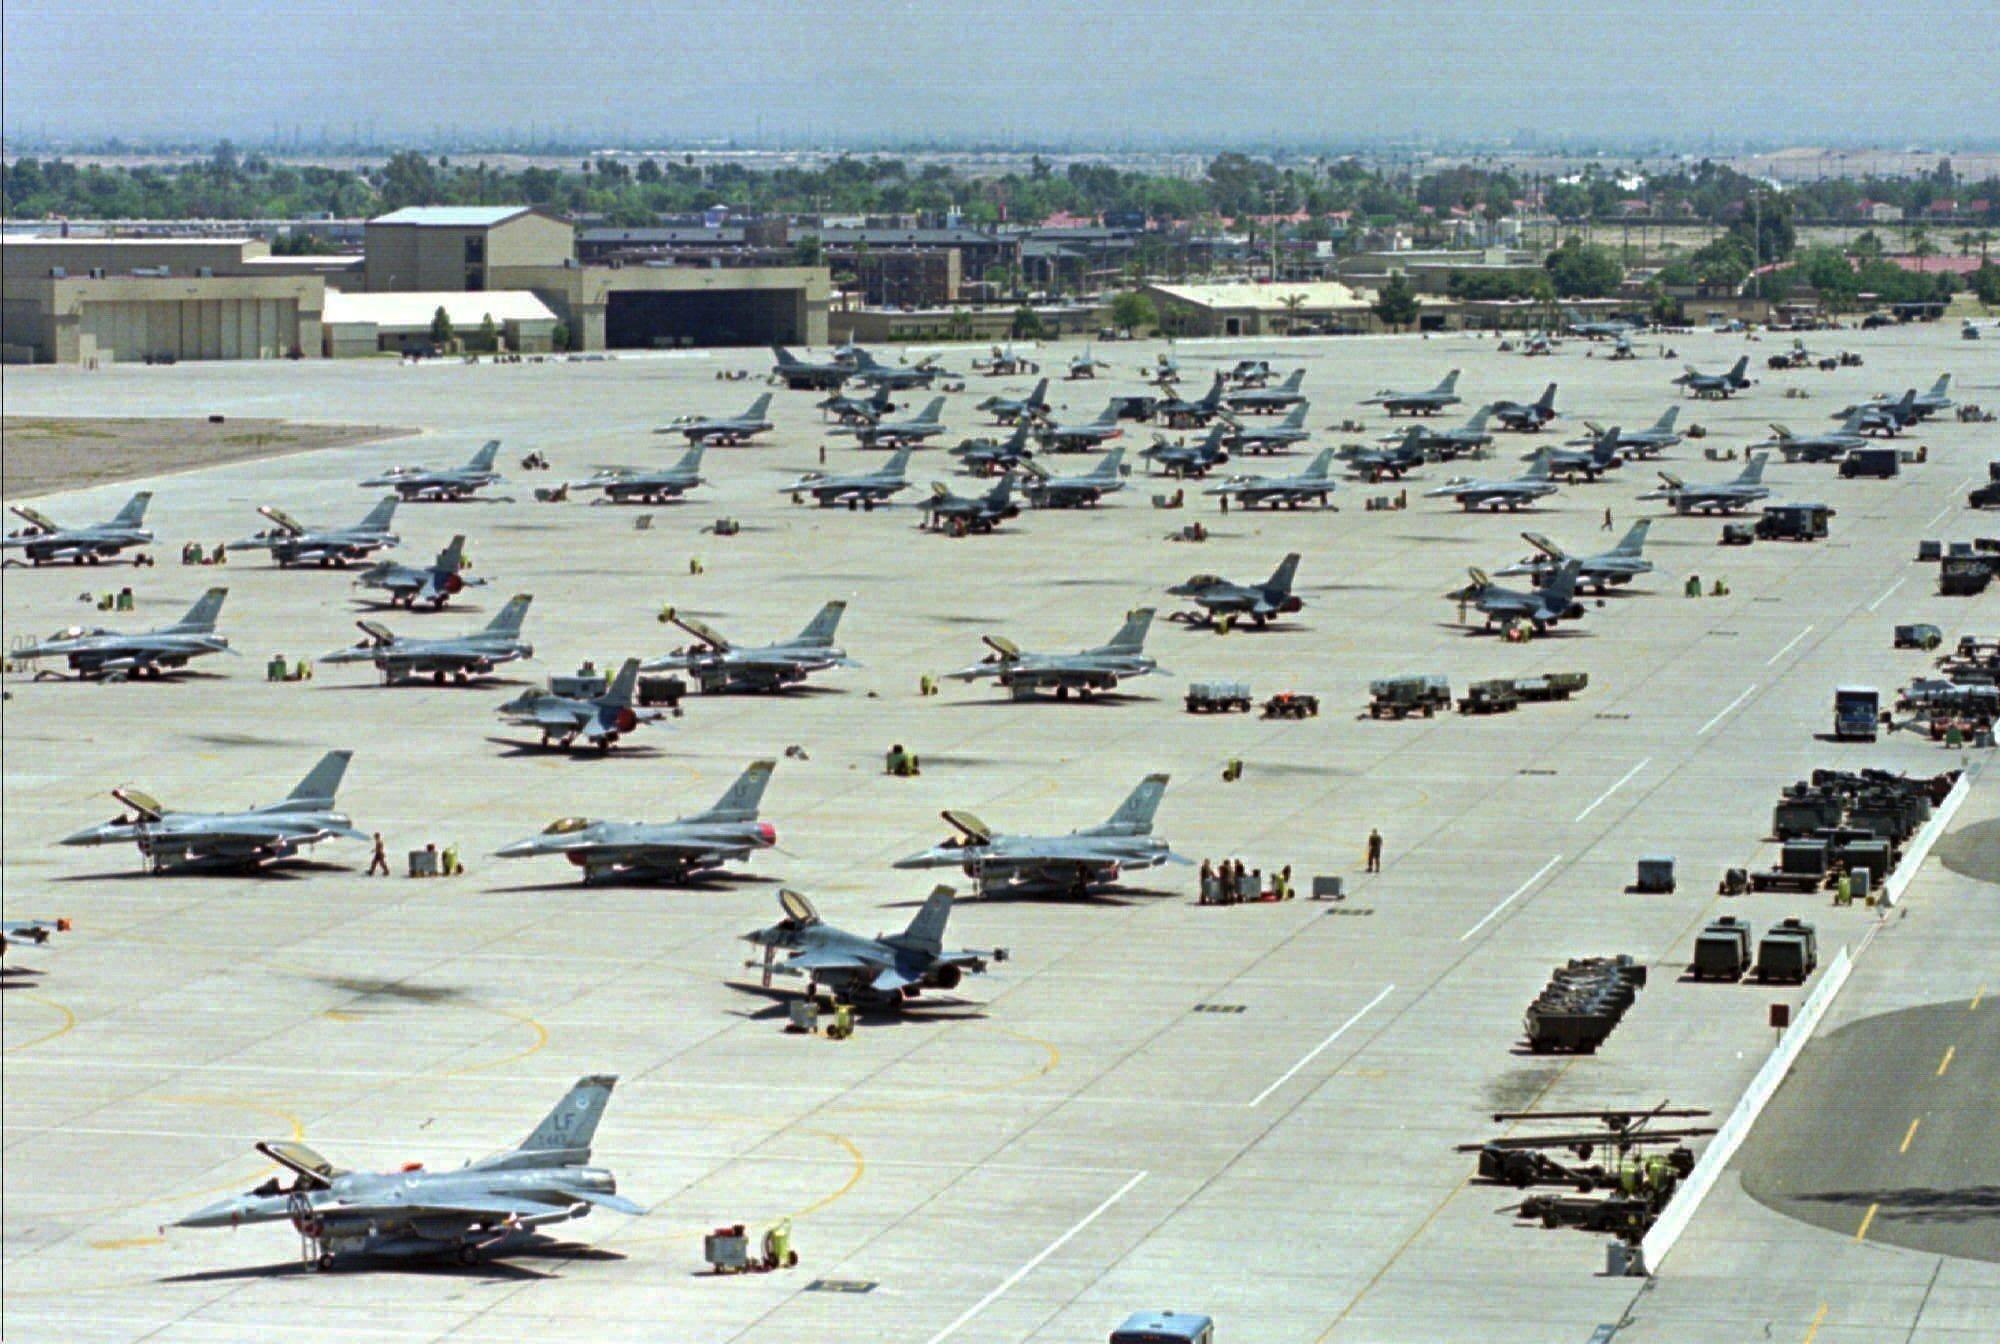 F-16 Fighting Falcons sit on the tarmac at Luke Air Force Base in Glendale, Arizona, April 14, 1999. (AP Photo/Ken Levine, File)